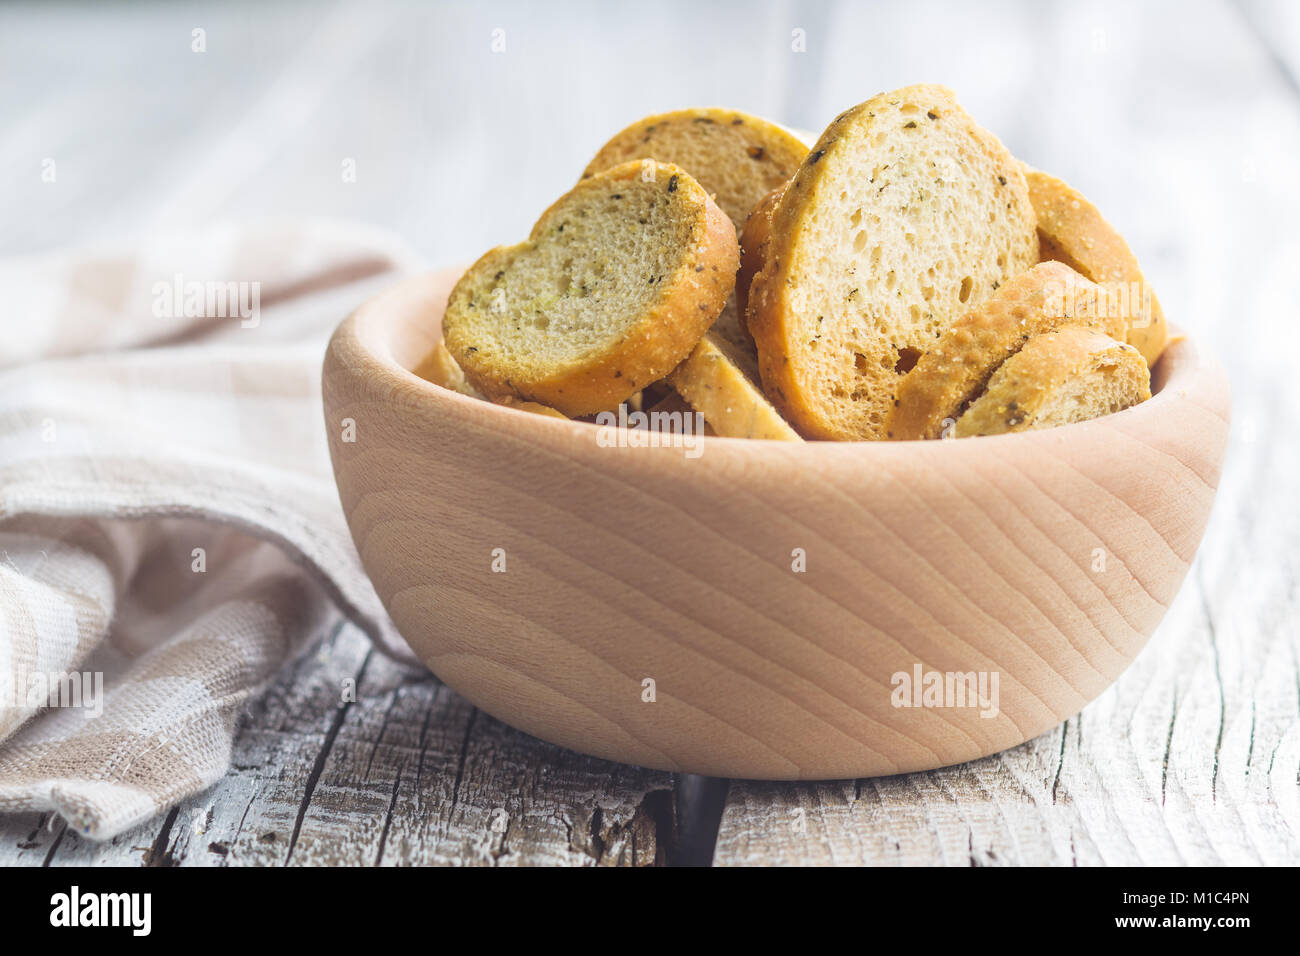 Bruschetta de pain croûté en bol en bois. Photo Stock